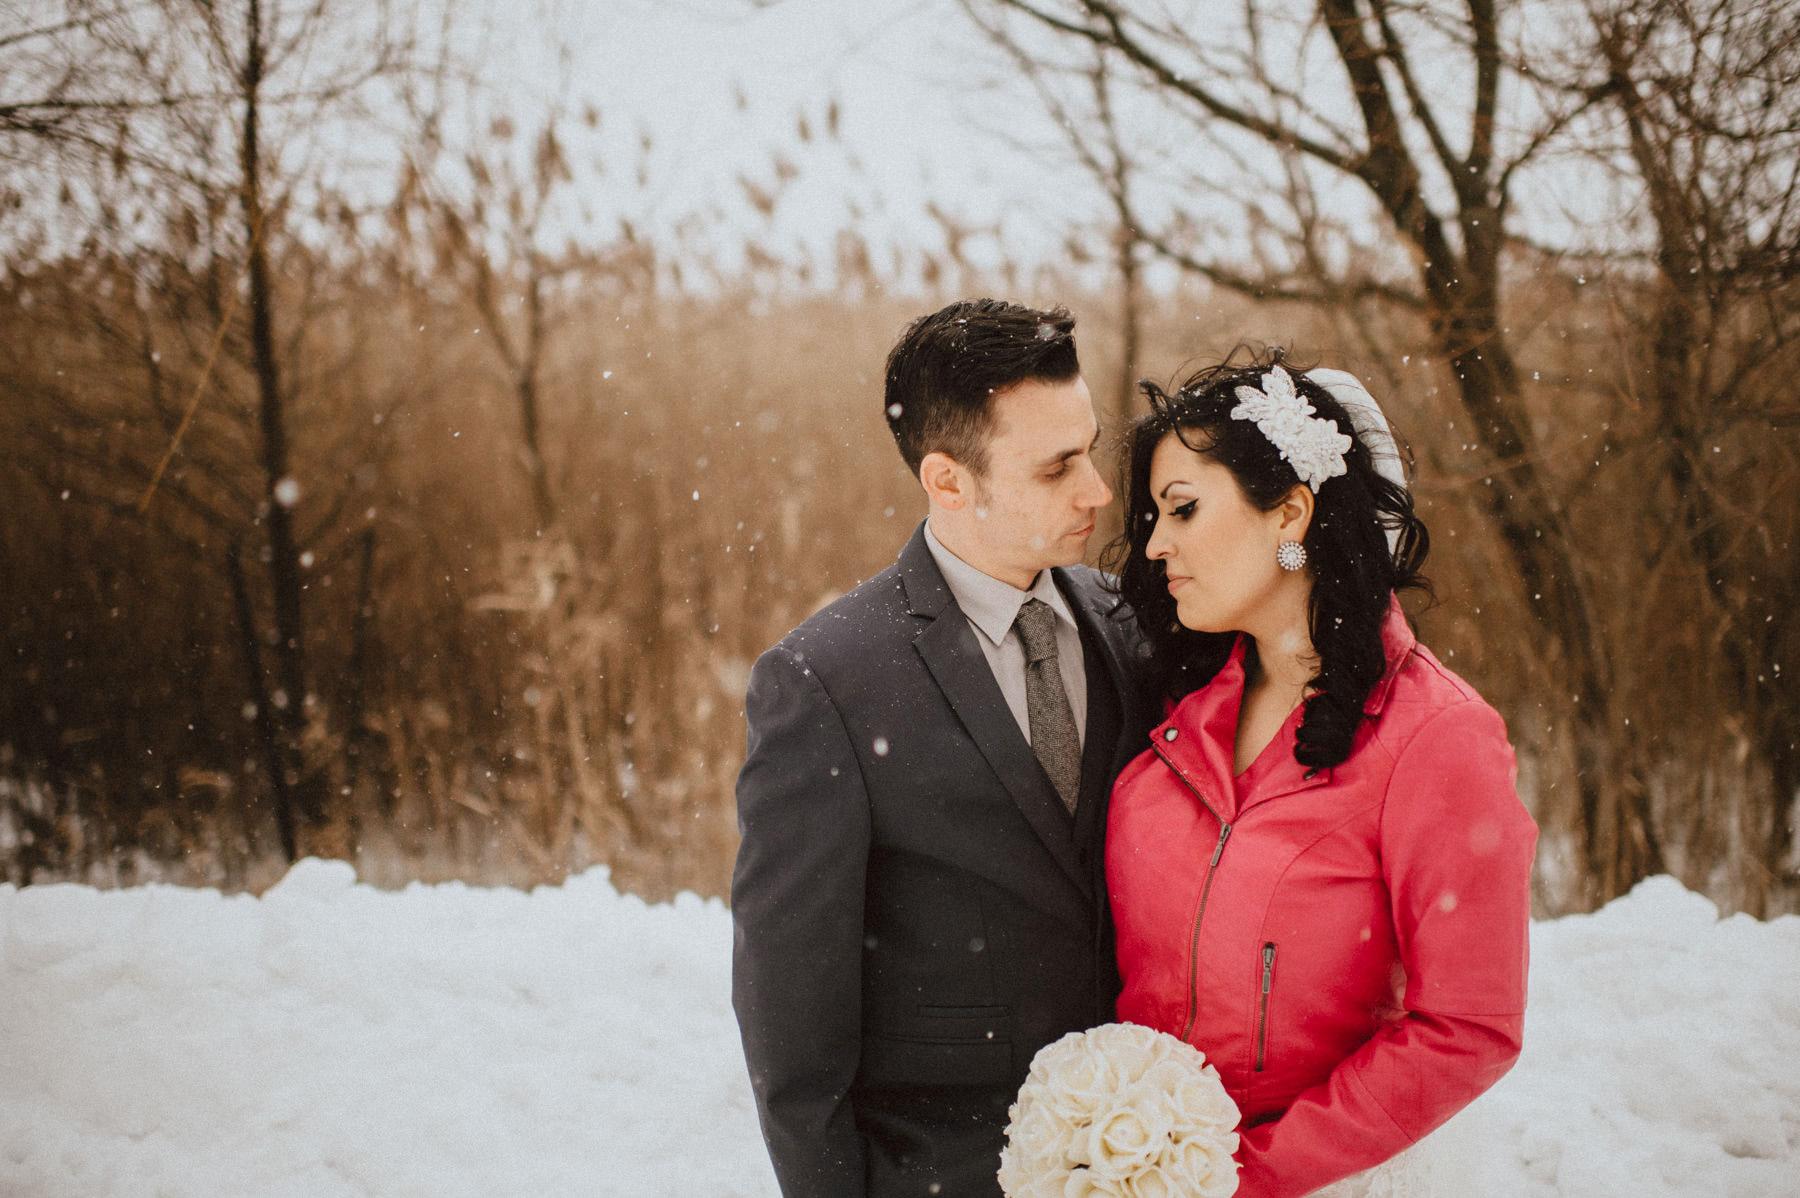 140-delaware-wedding-photographer-1.jpg